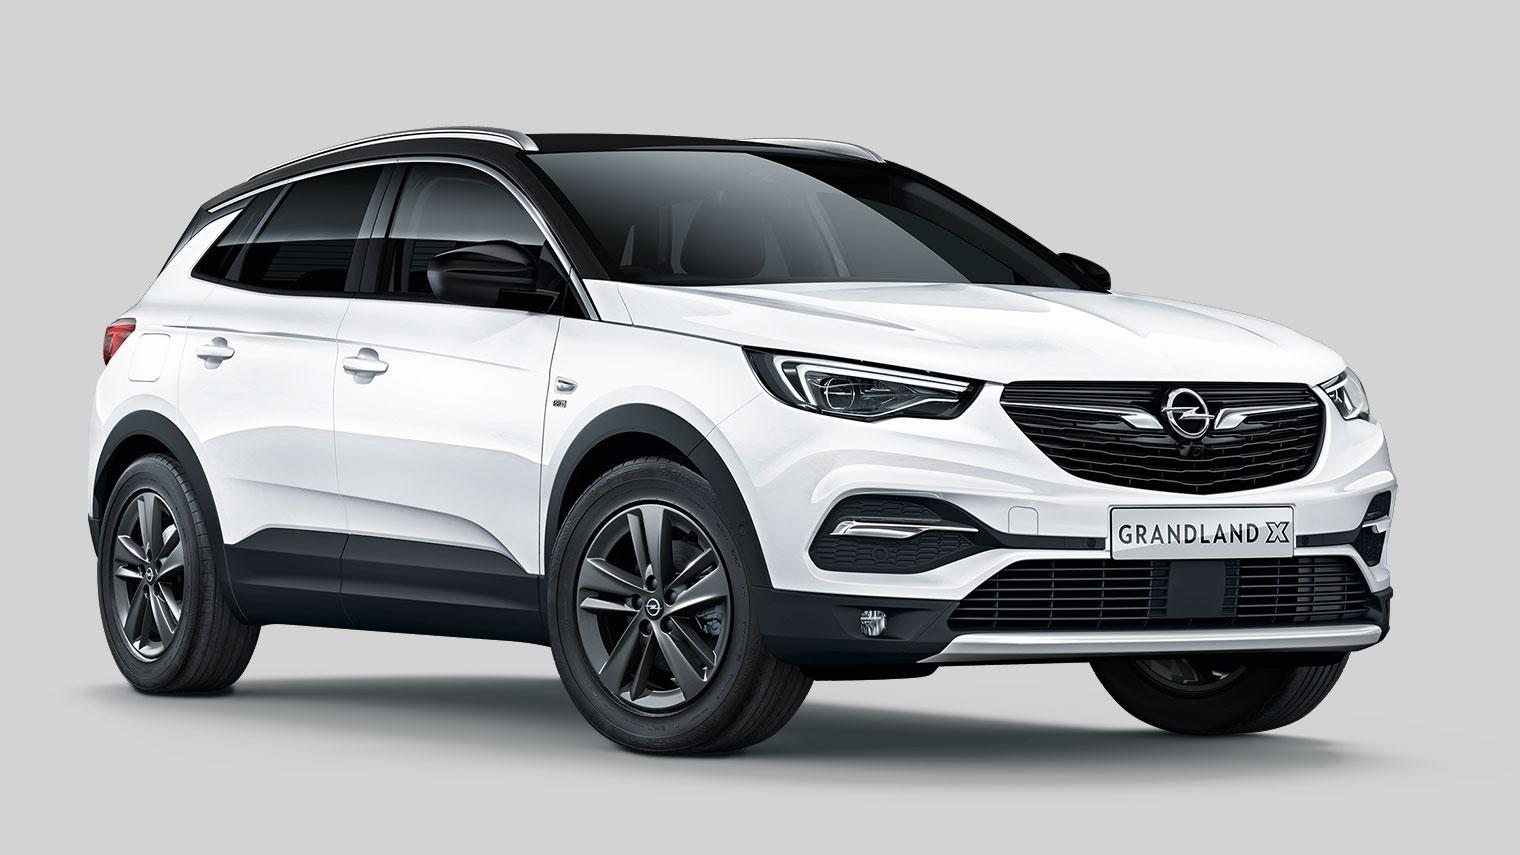 Opel Grandland Leasing : opel grandland x priv leasen anwb private lease ~ Aude.kayakingforconservation.com Haus und Dekorationen